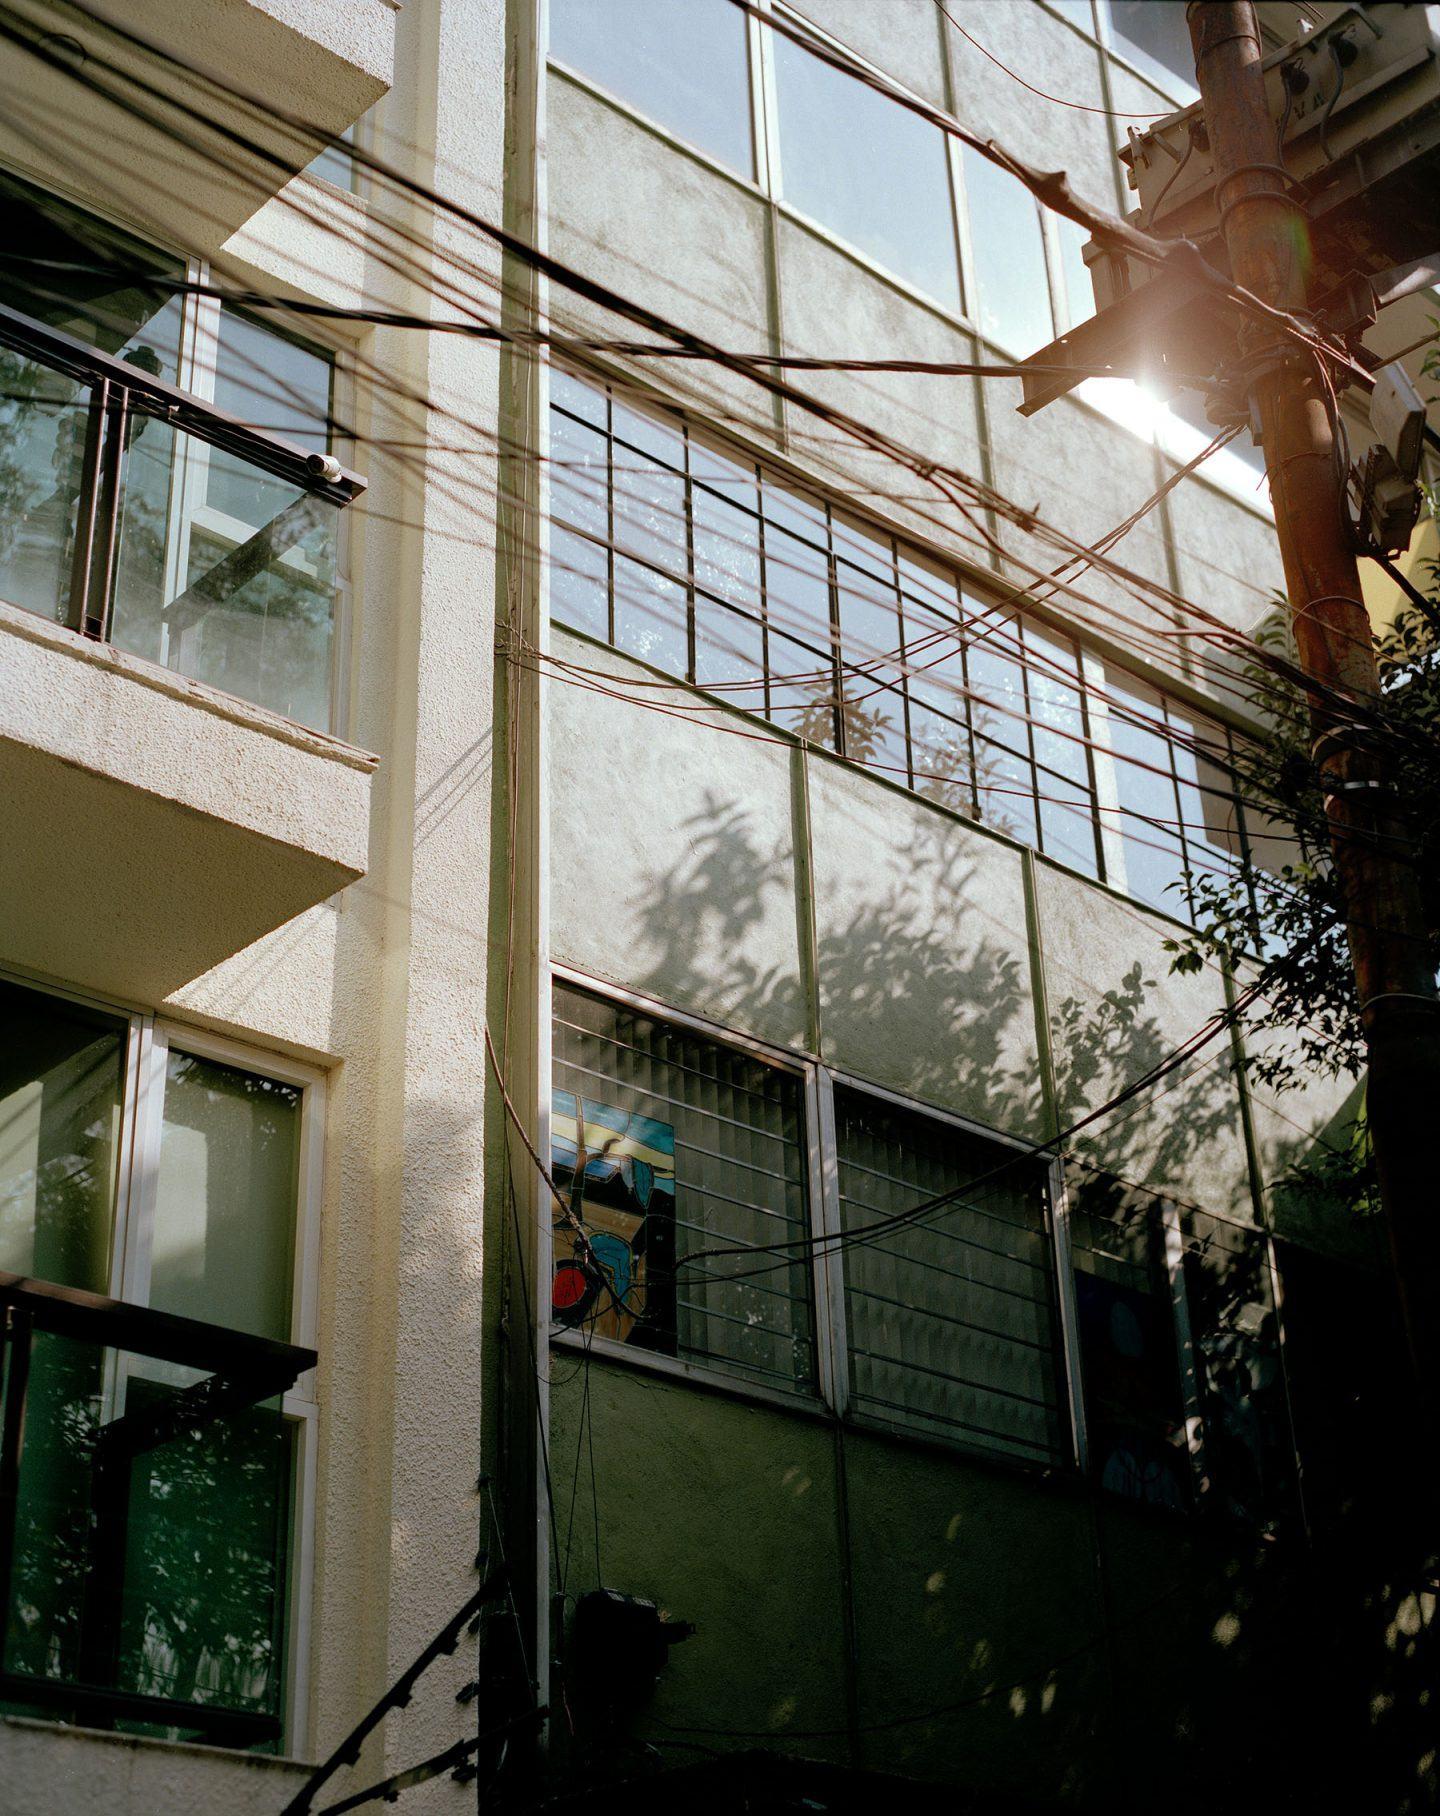 IGNANT-Photography-Joe-Perri-Mexico-14